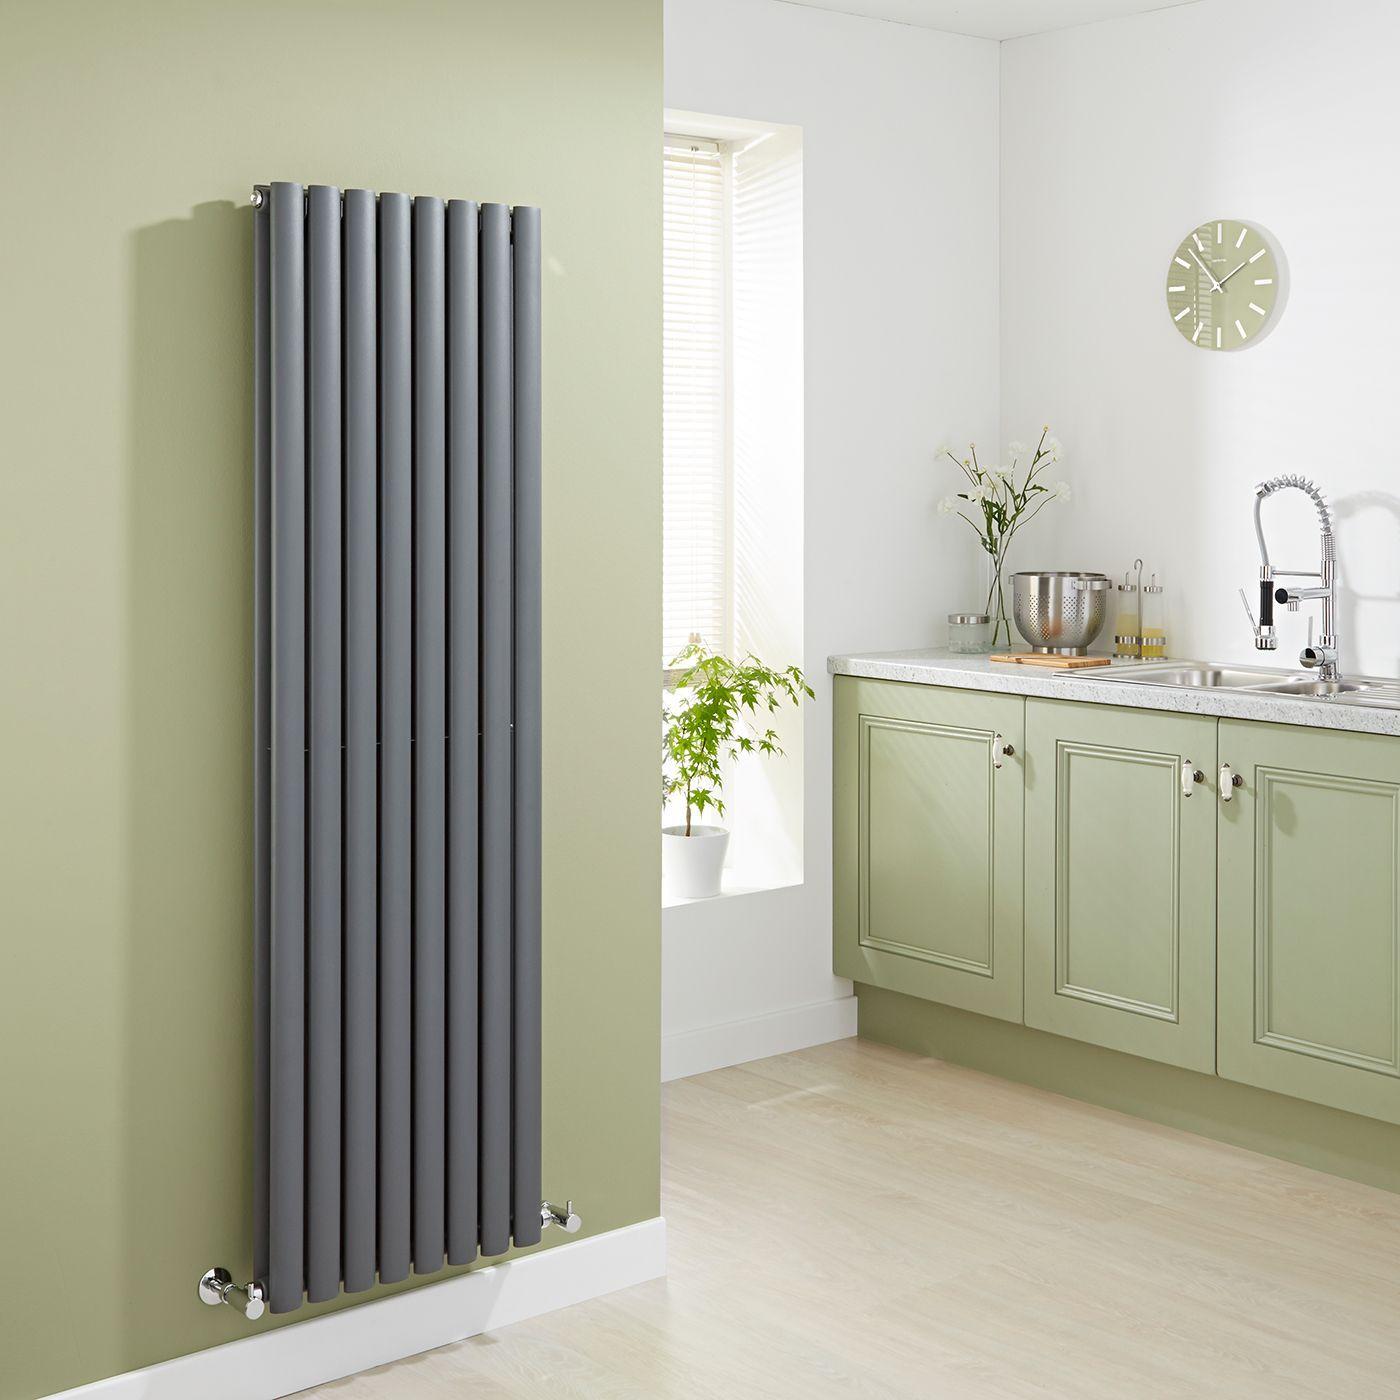 designer radiators for kitchens. Milano Aruba  Anthracite Grey Vertical Designer Radiator 1600mm x 472mm Double Panel